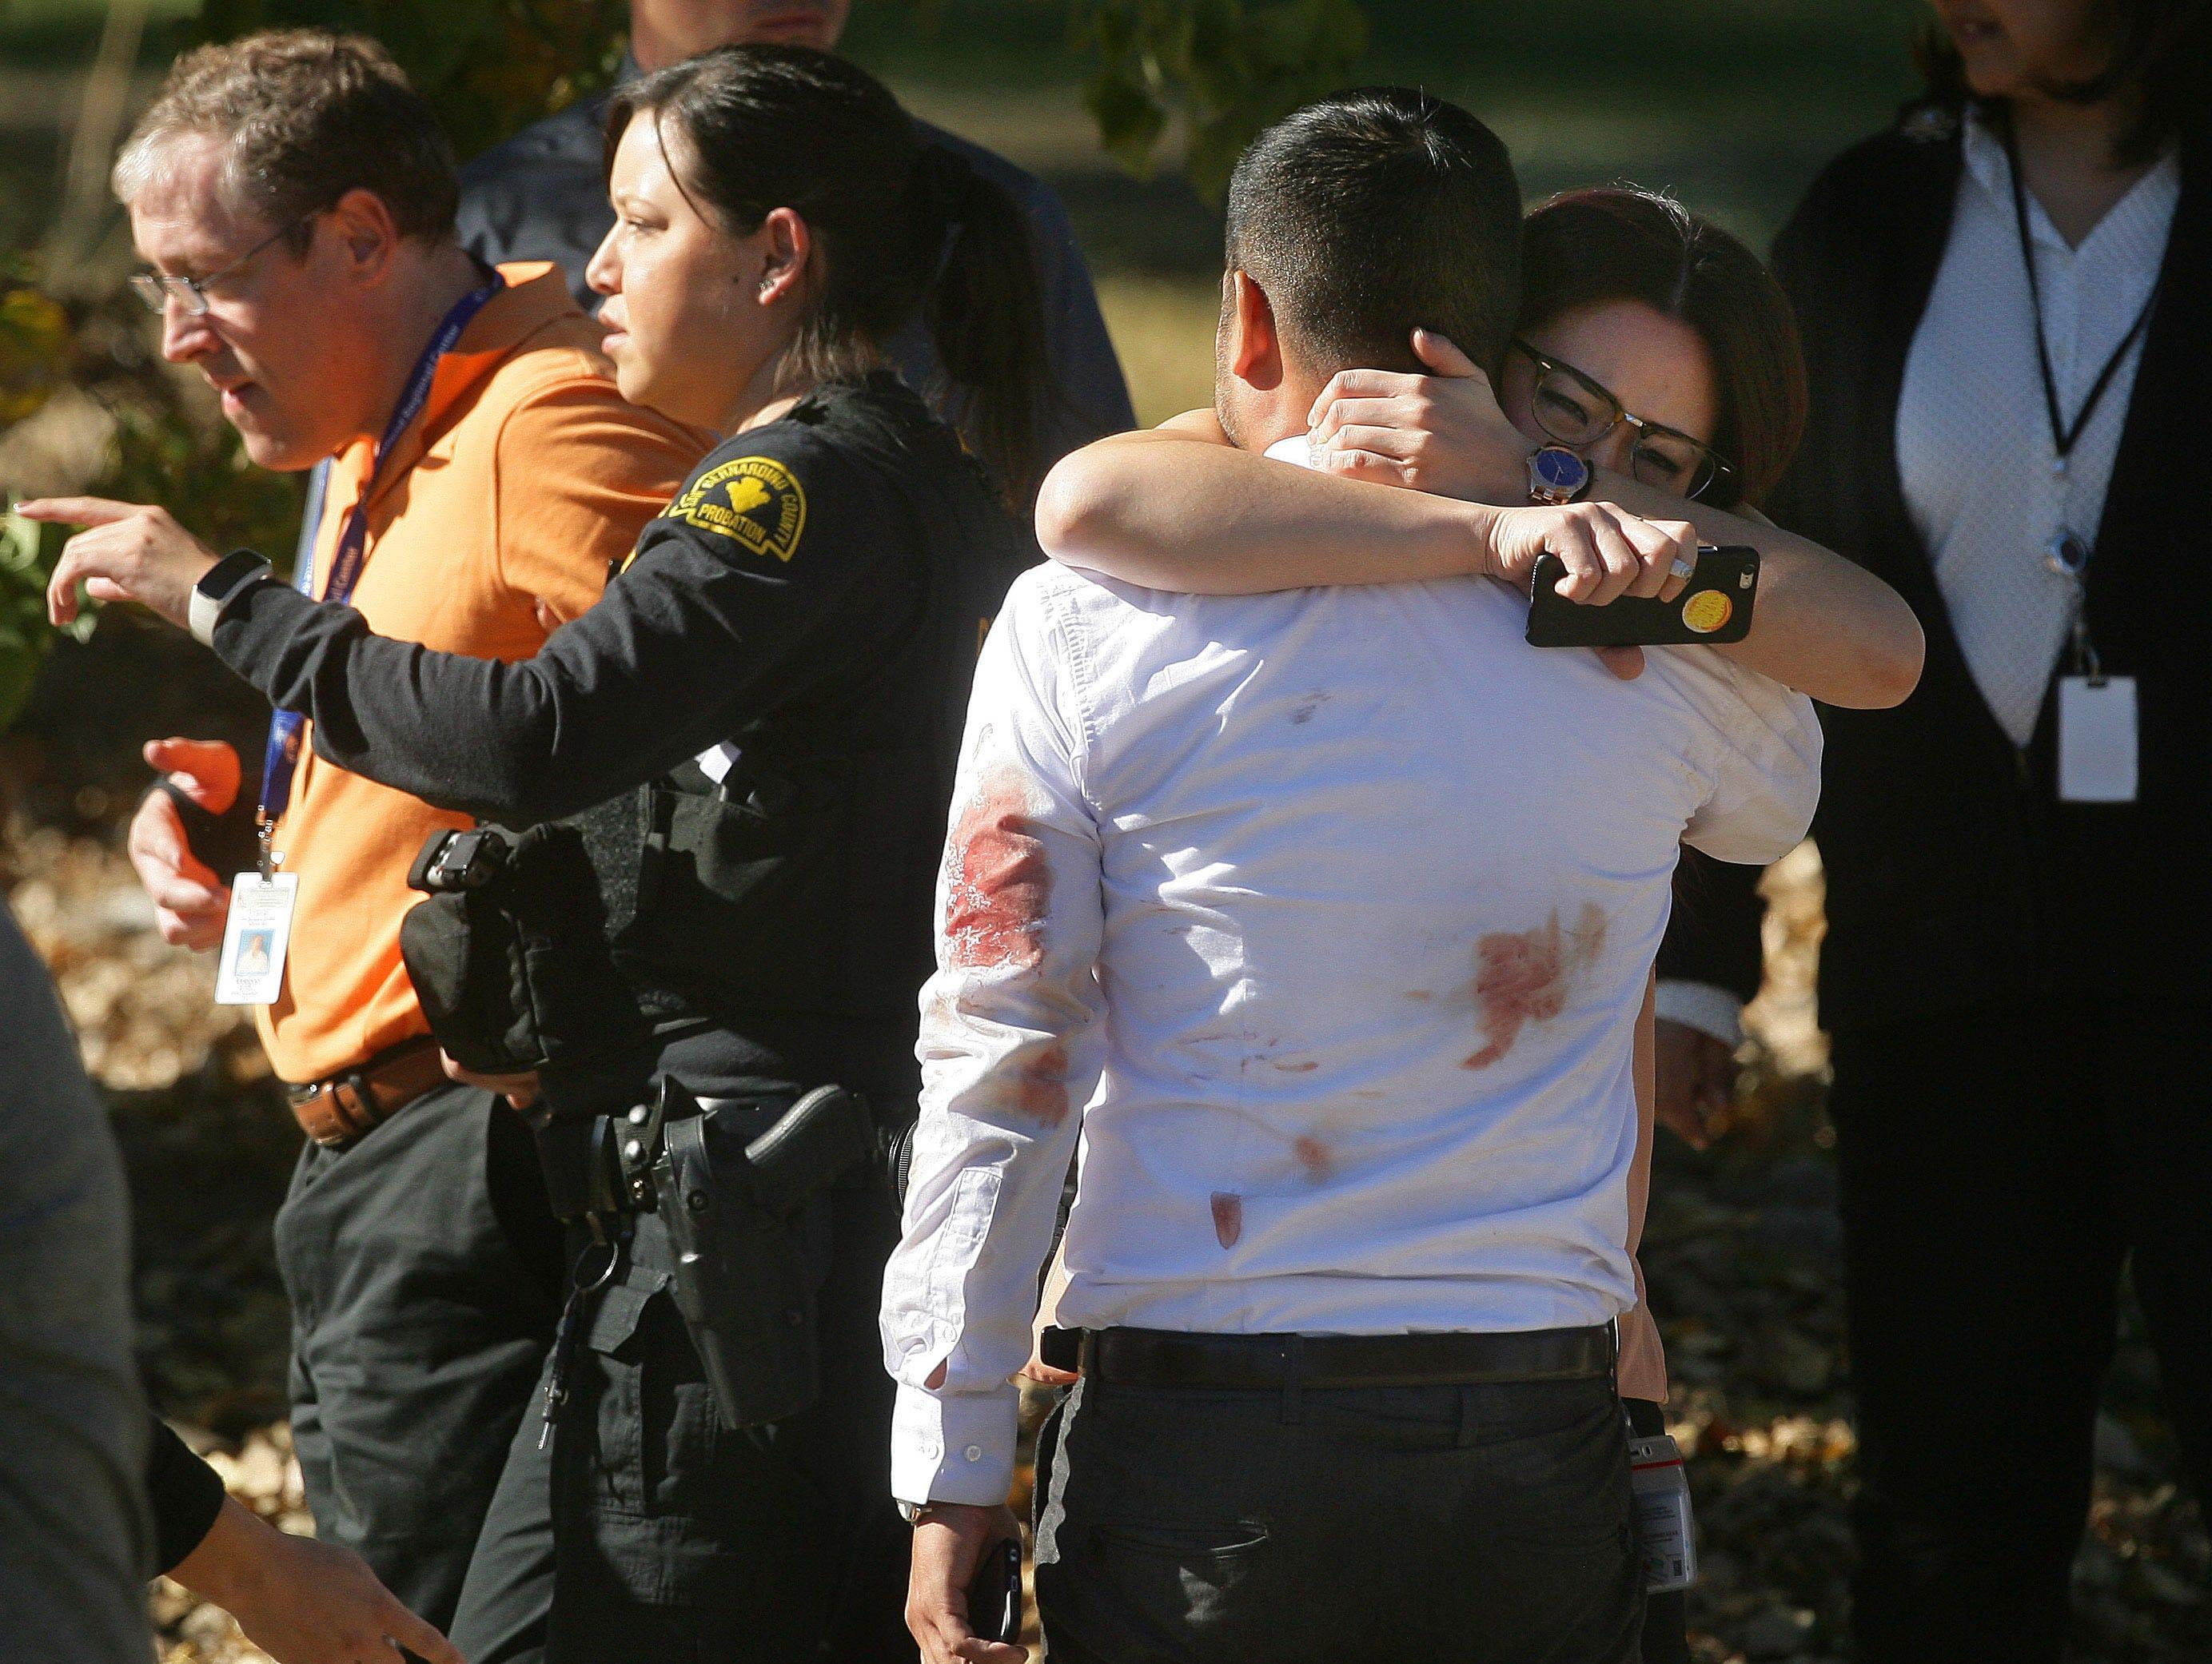 Inland Regional Center   San Bernardino, California   Dec. 2, 2015   16 dead   24 wounded